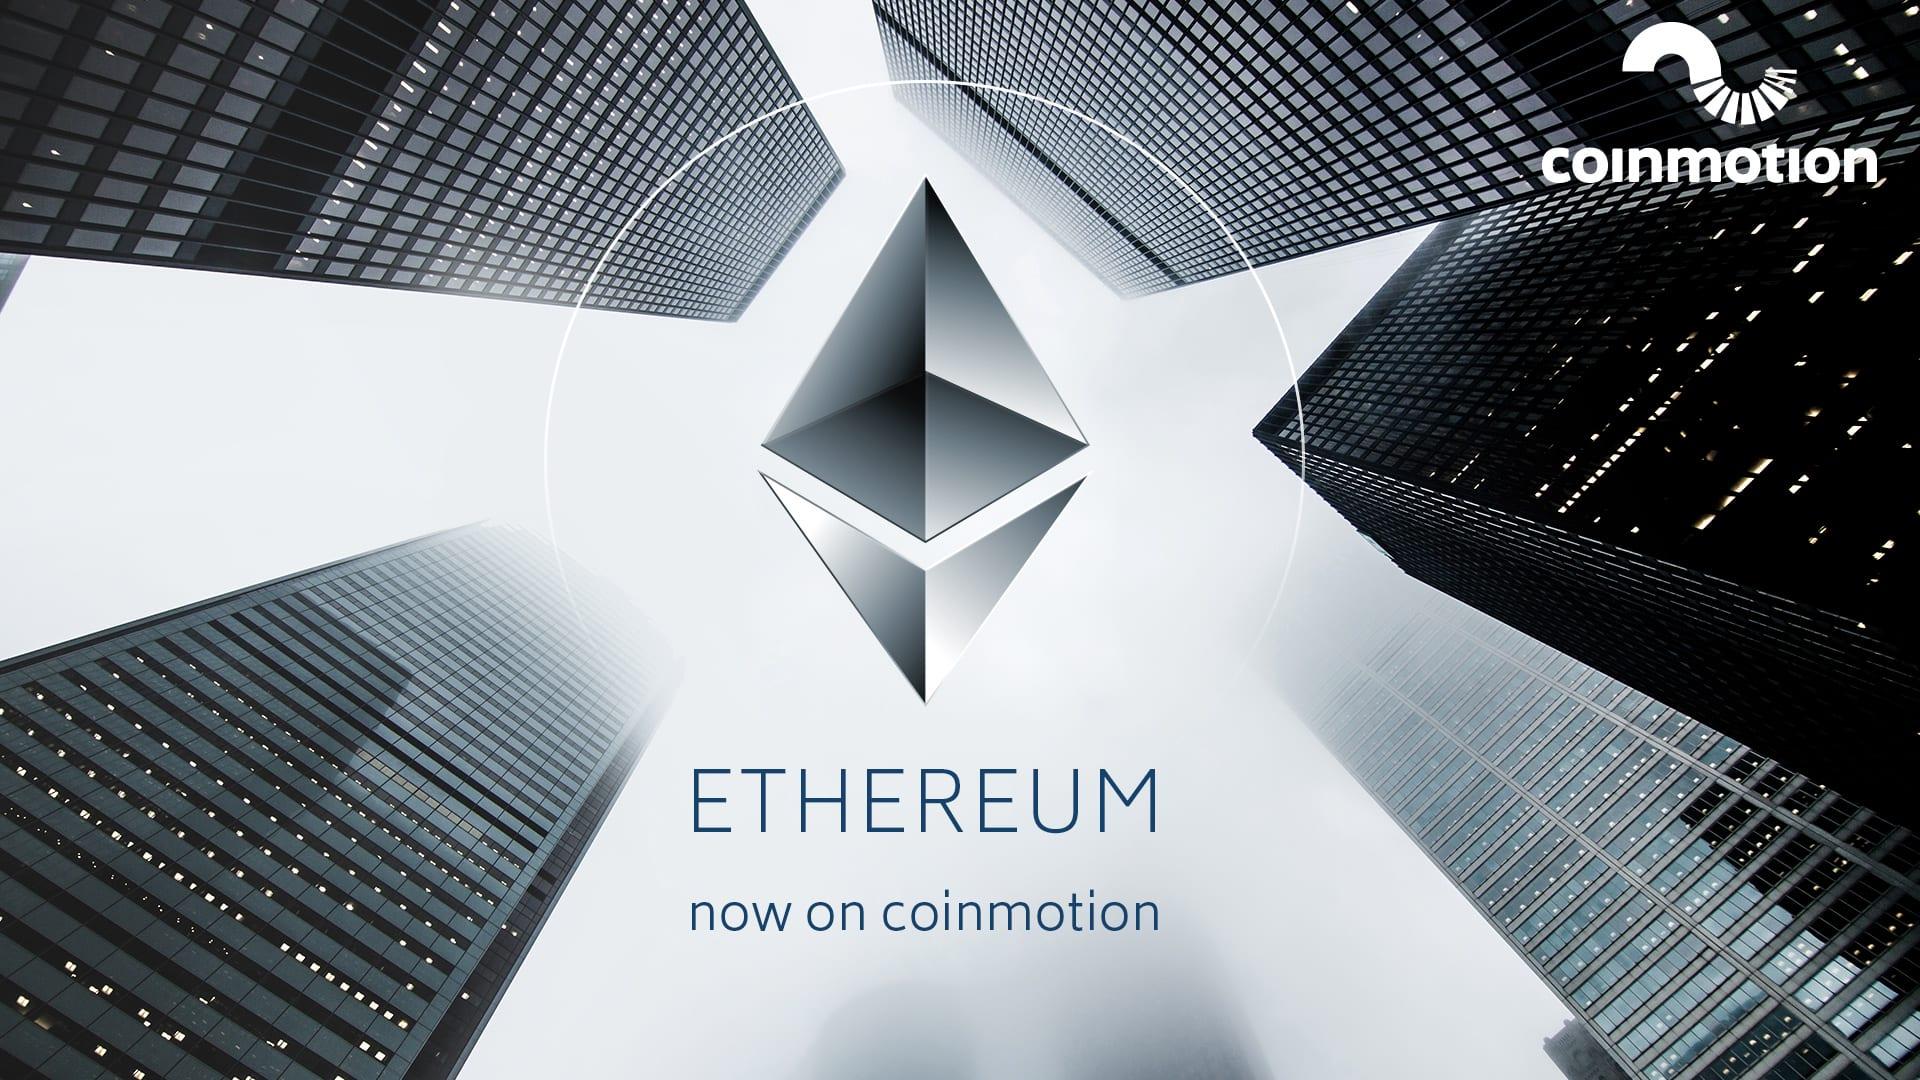 coinmotion_ethereum_1_now_coinmotion